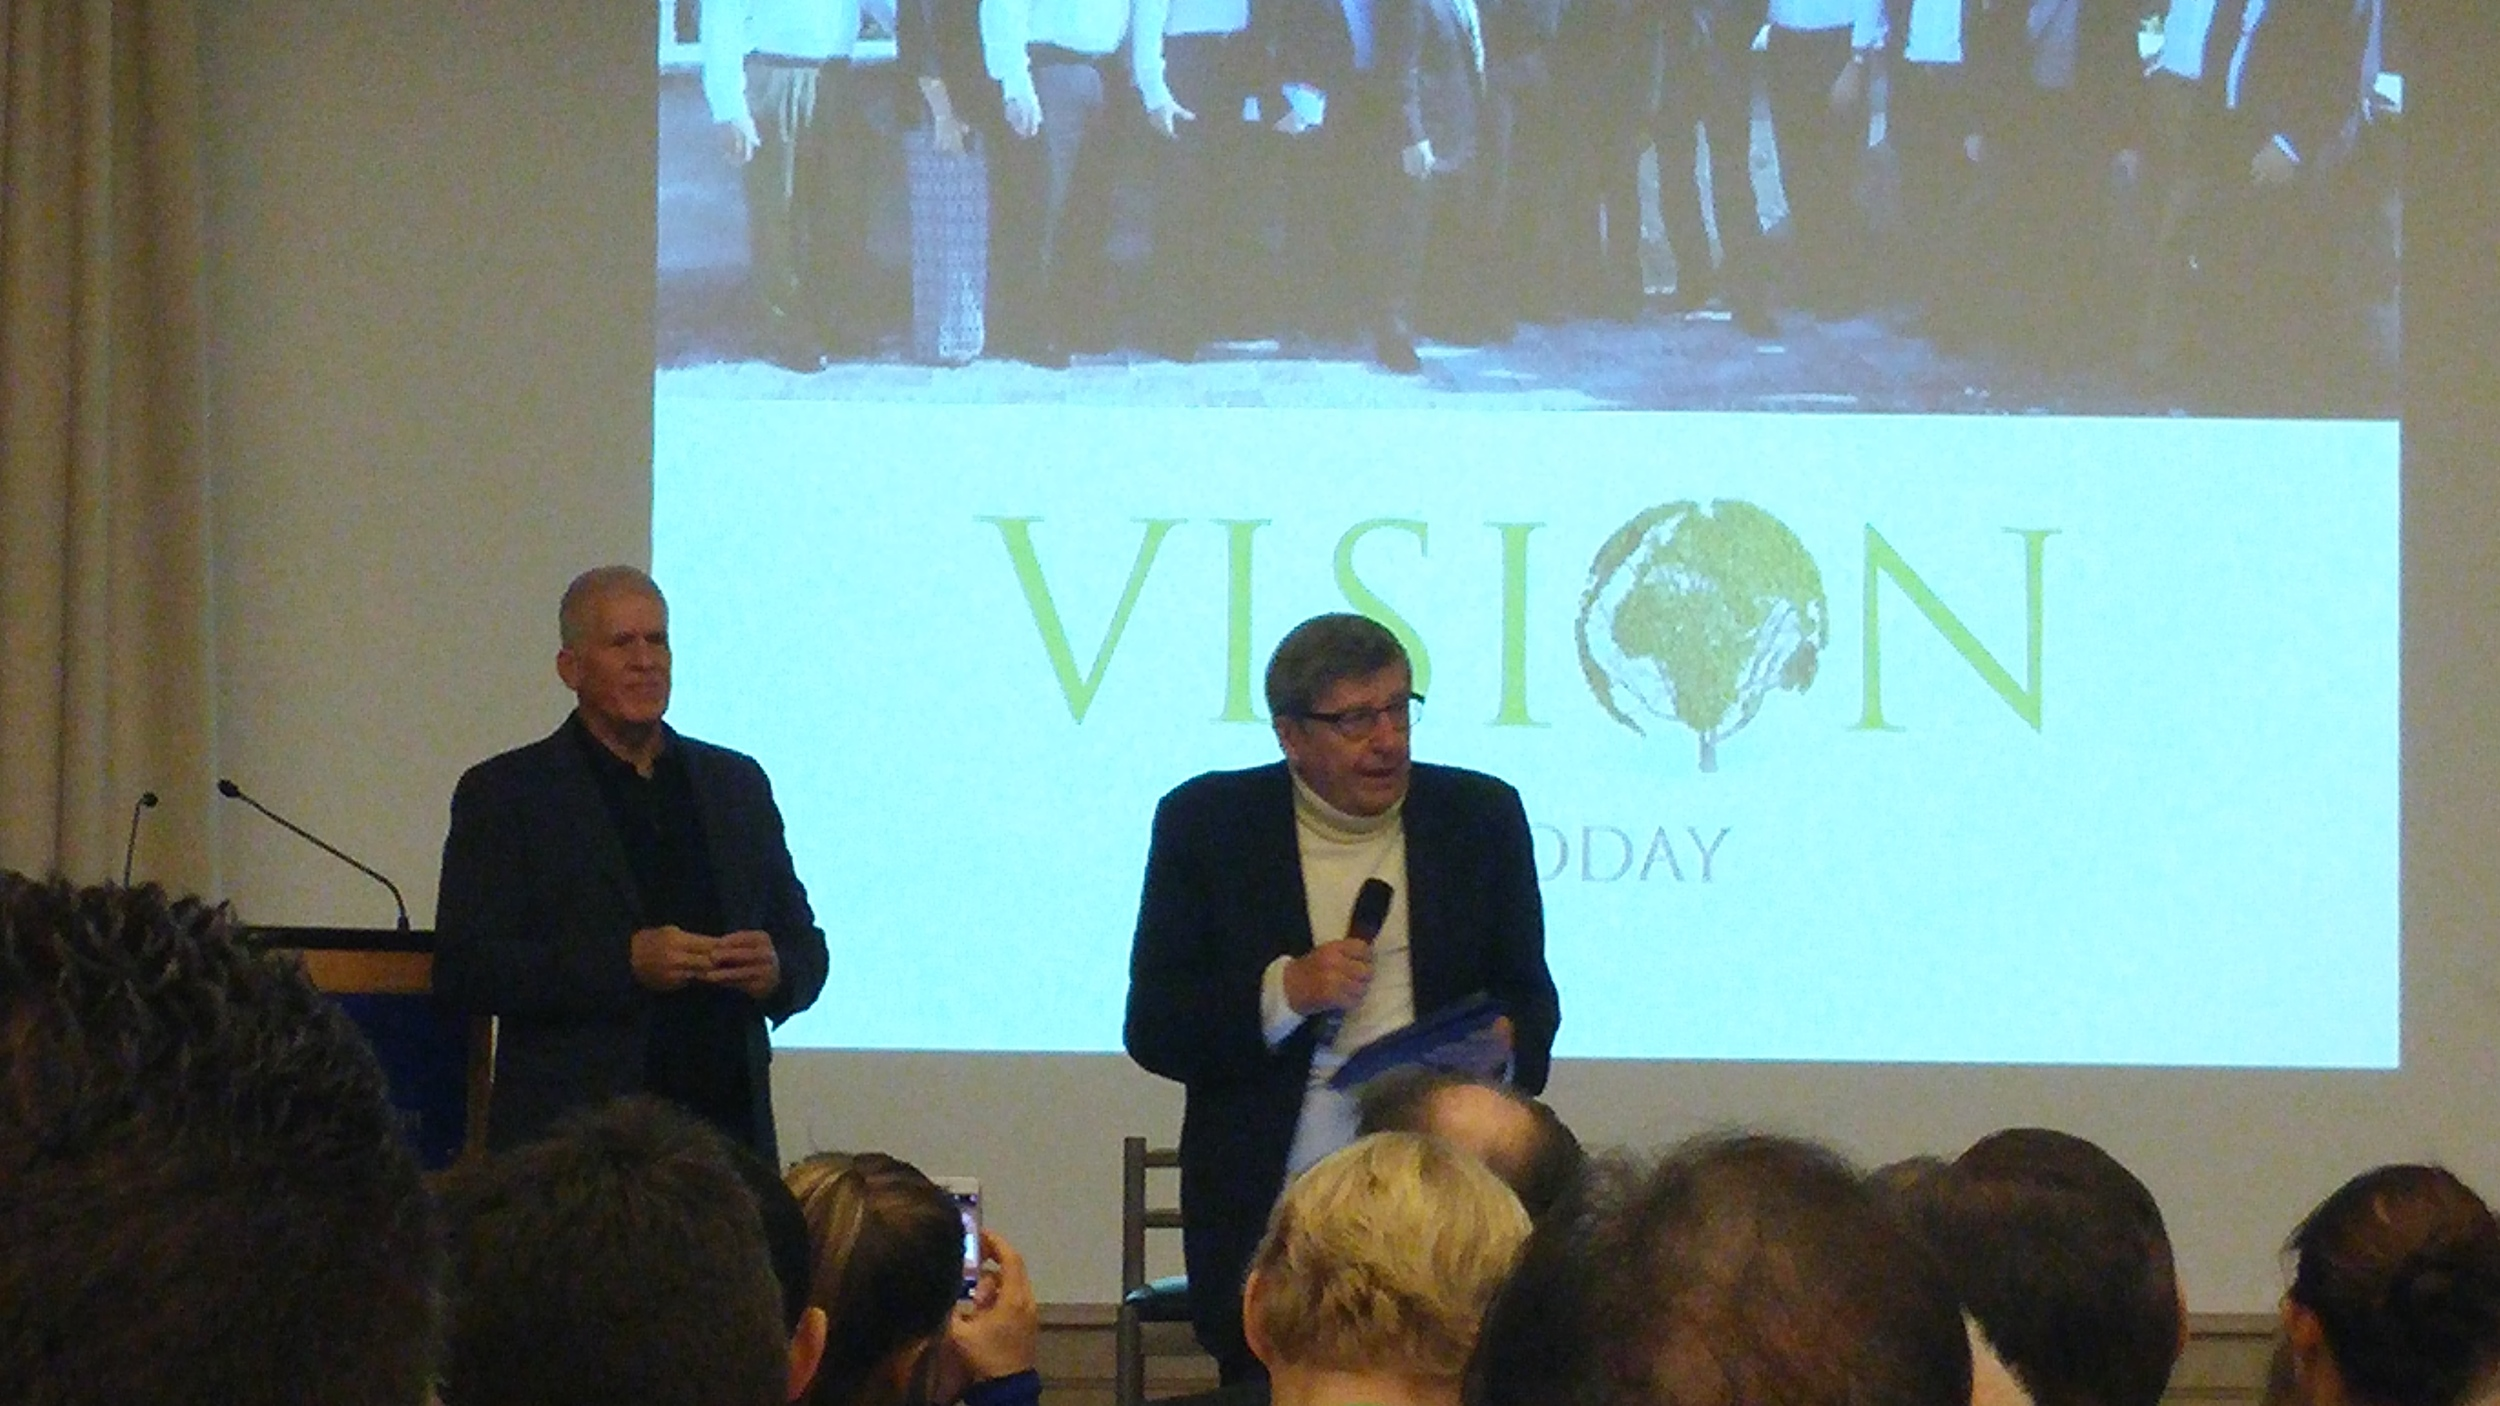 Guy Riekeman e Vincenzo Scotti.